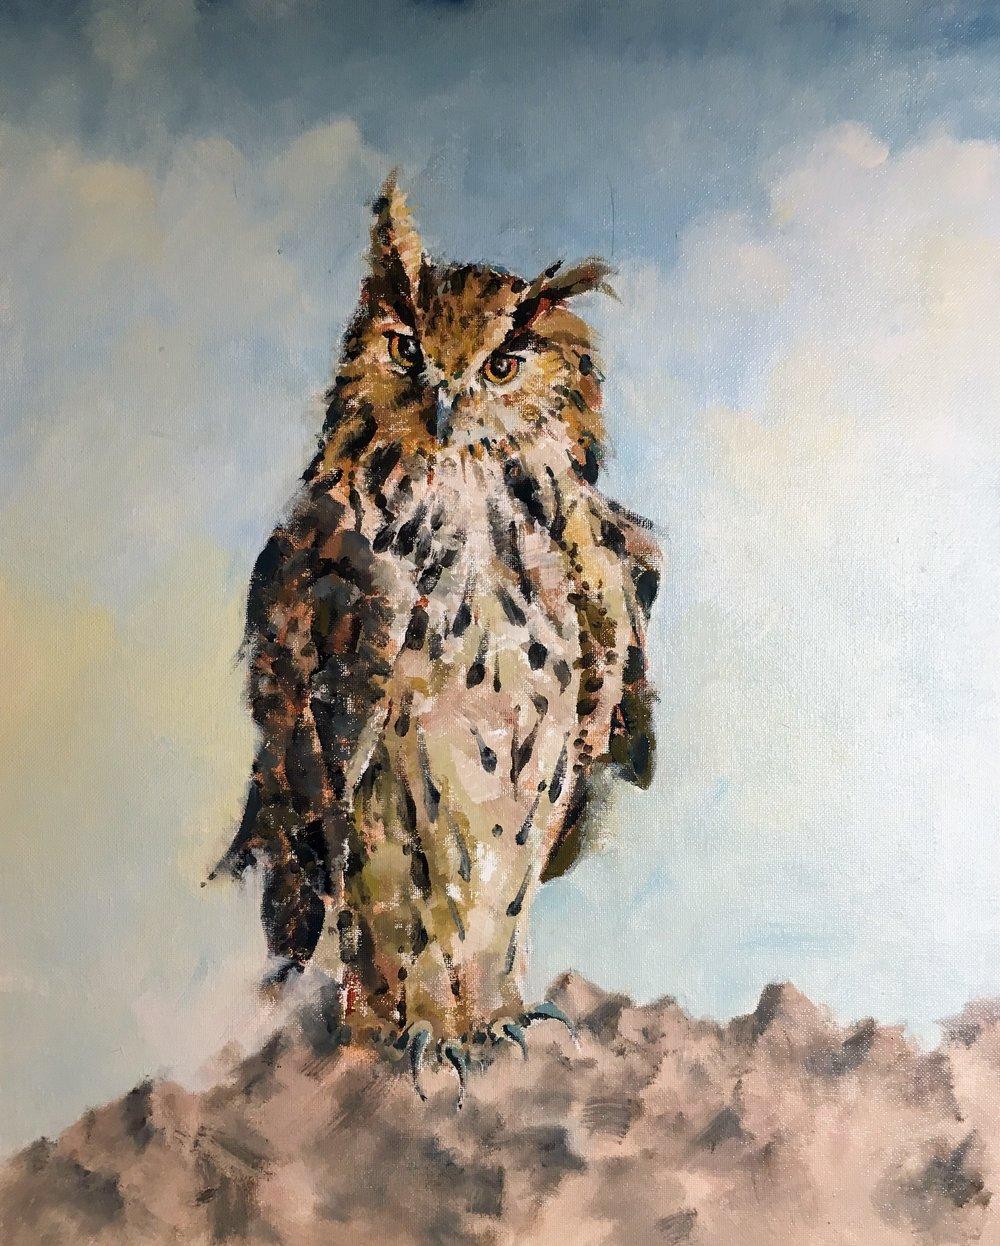 owl_oil_painting.jpg